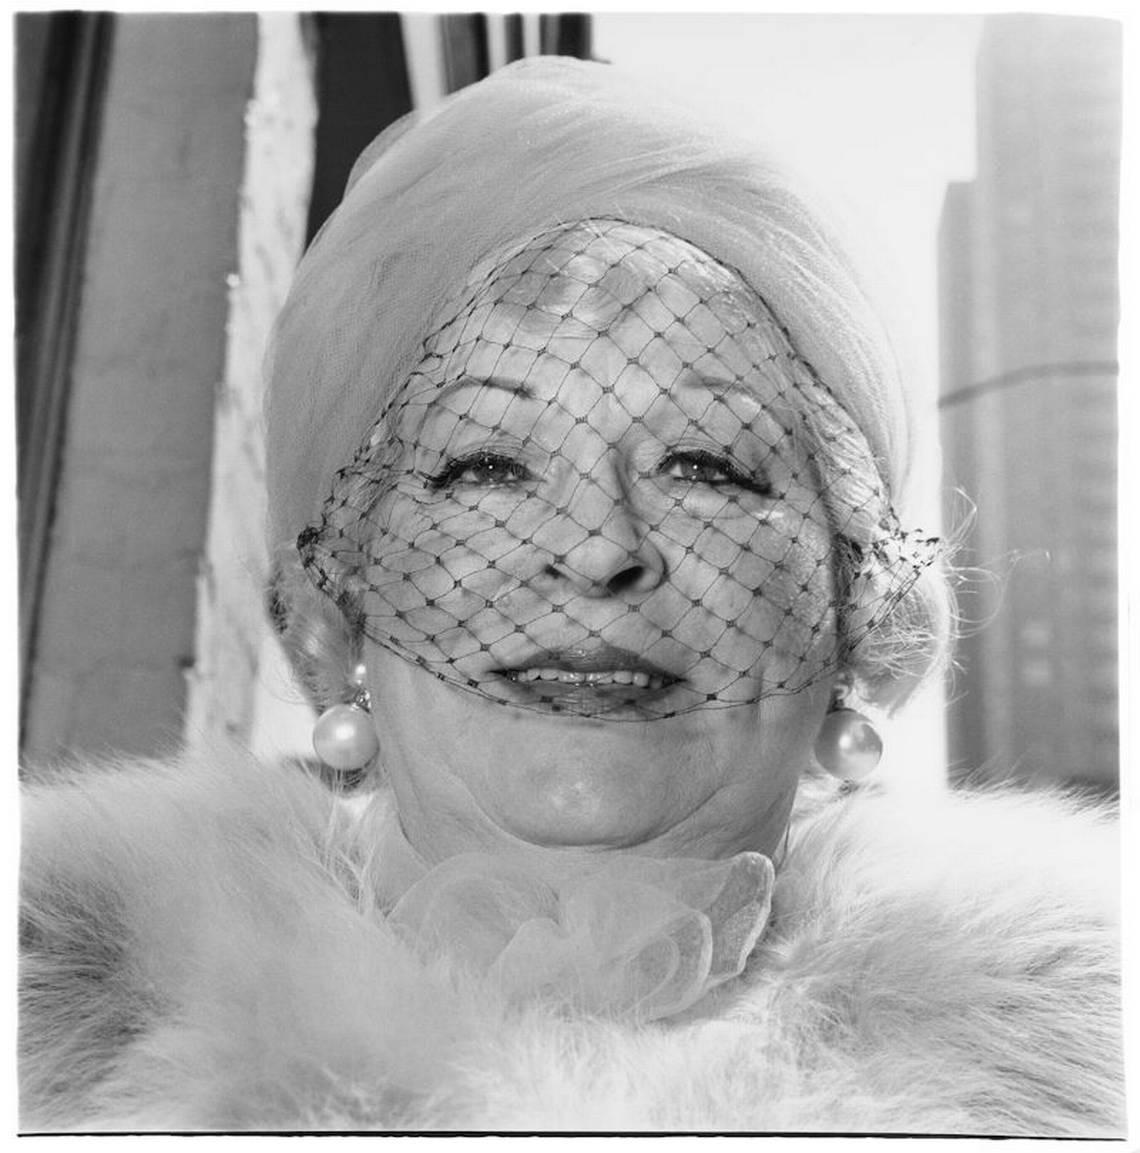 Diane Arbus, Woman with a veil on Fifth Avenue, N.Y.C. 1968